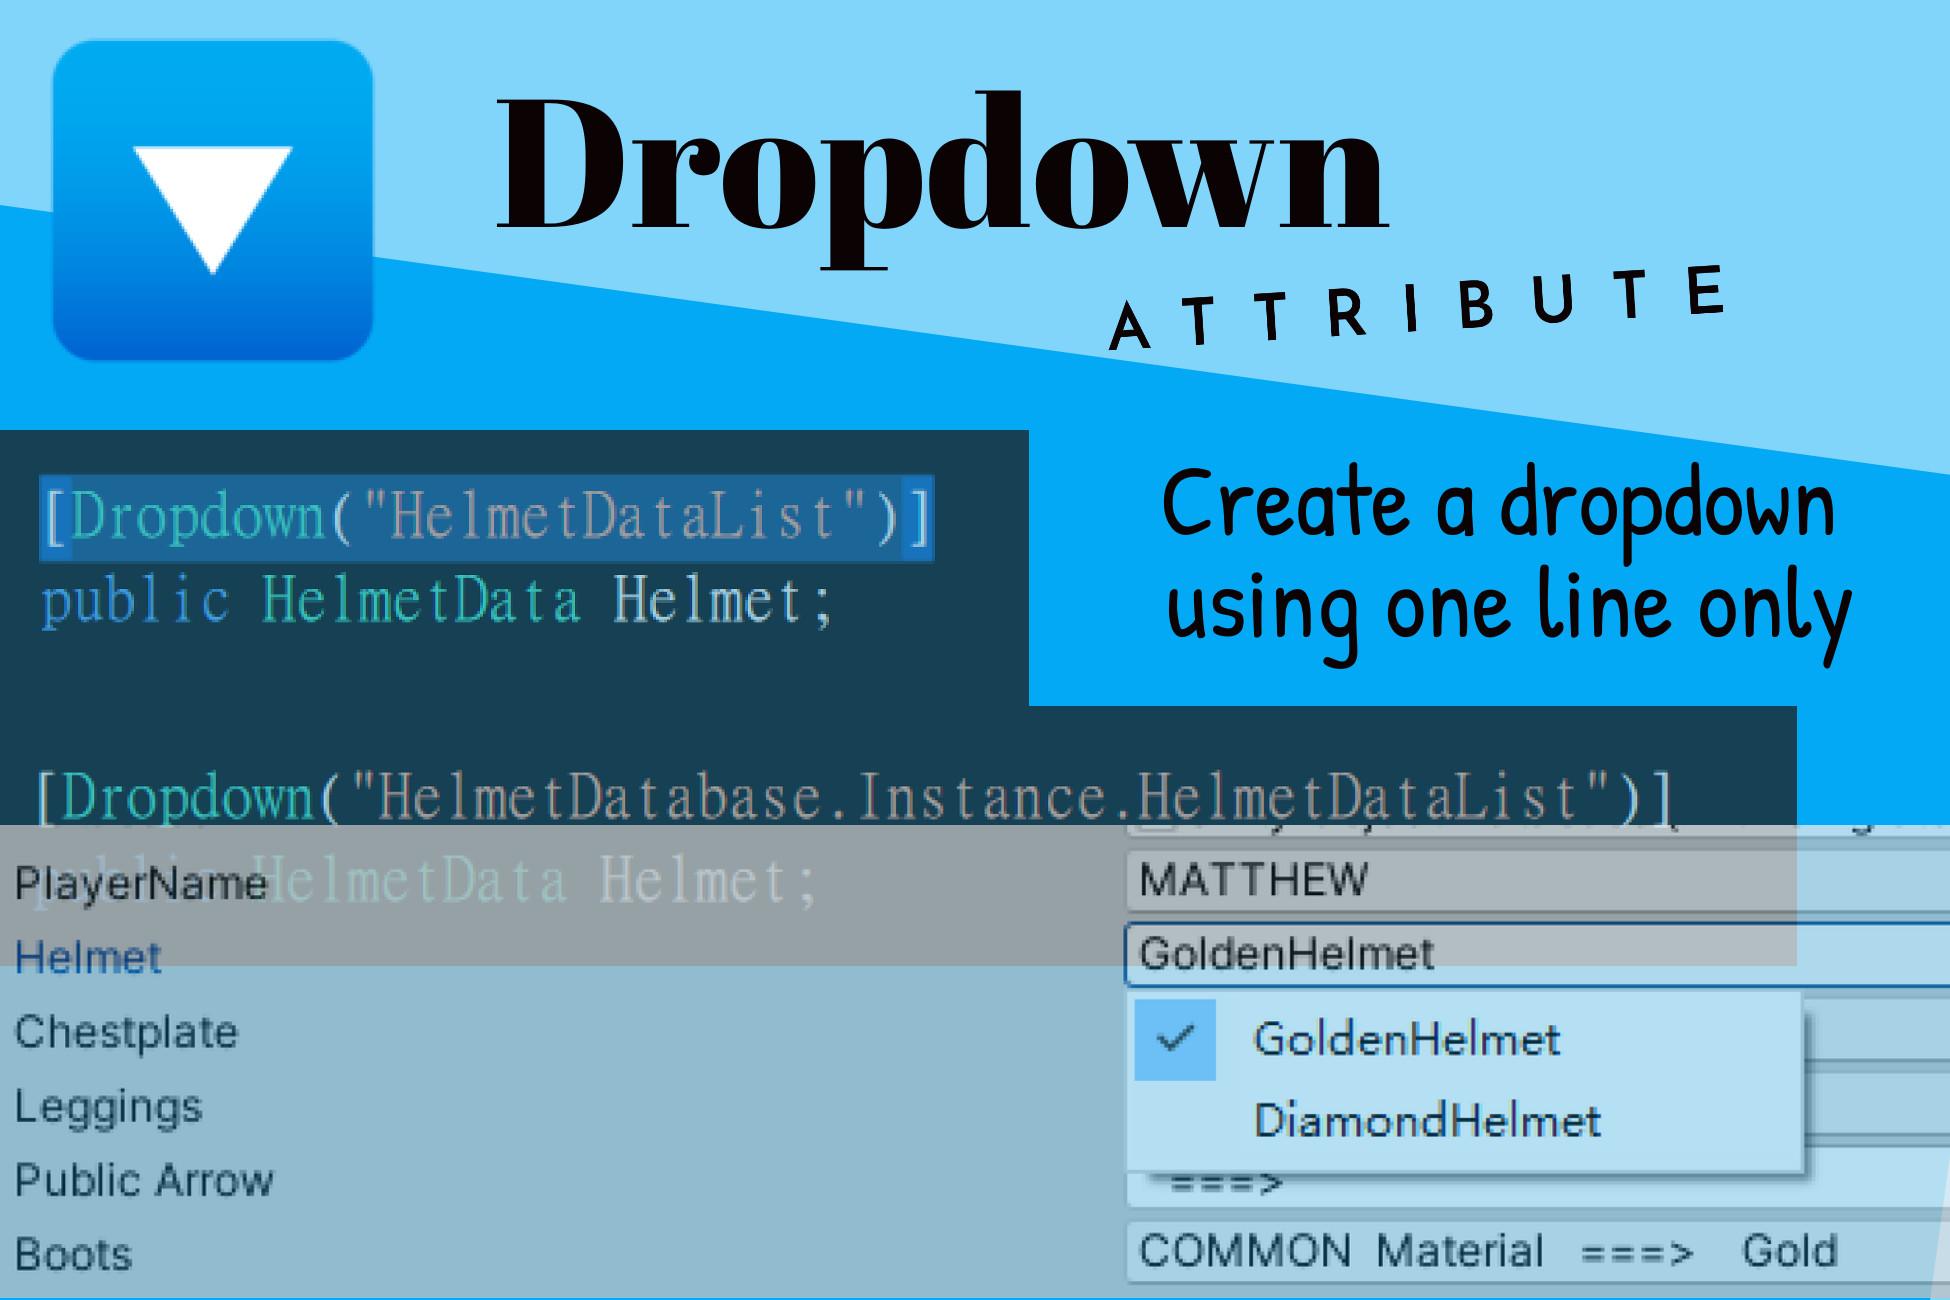 Dropdown Attribute